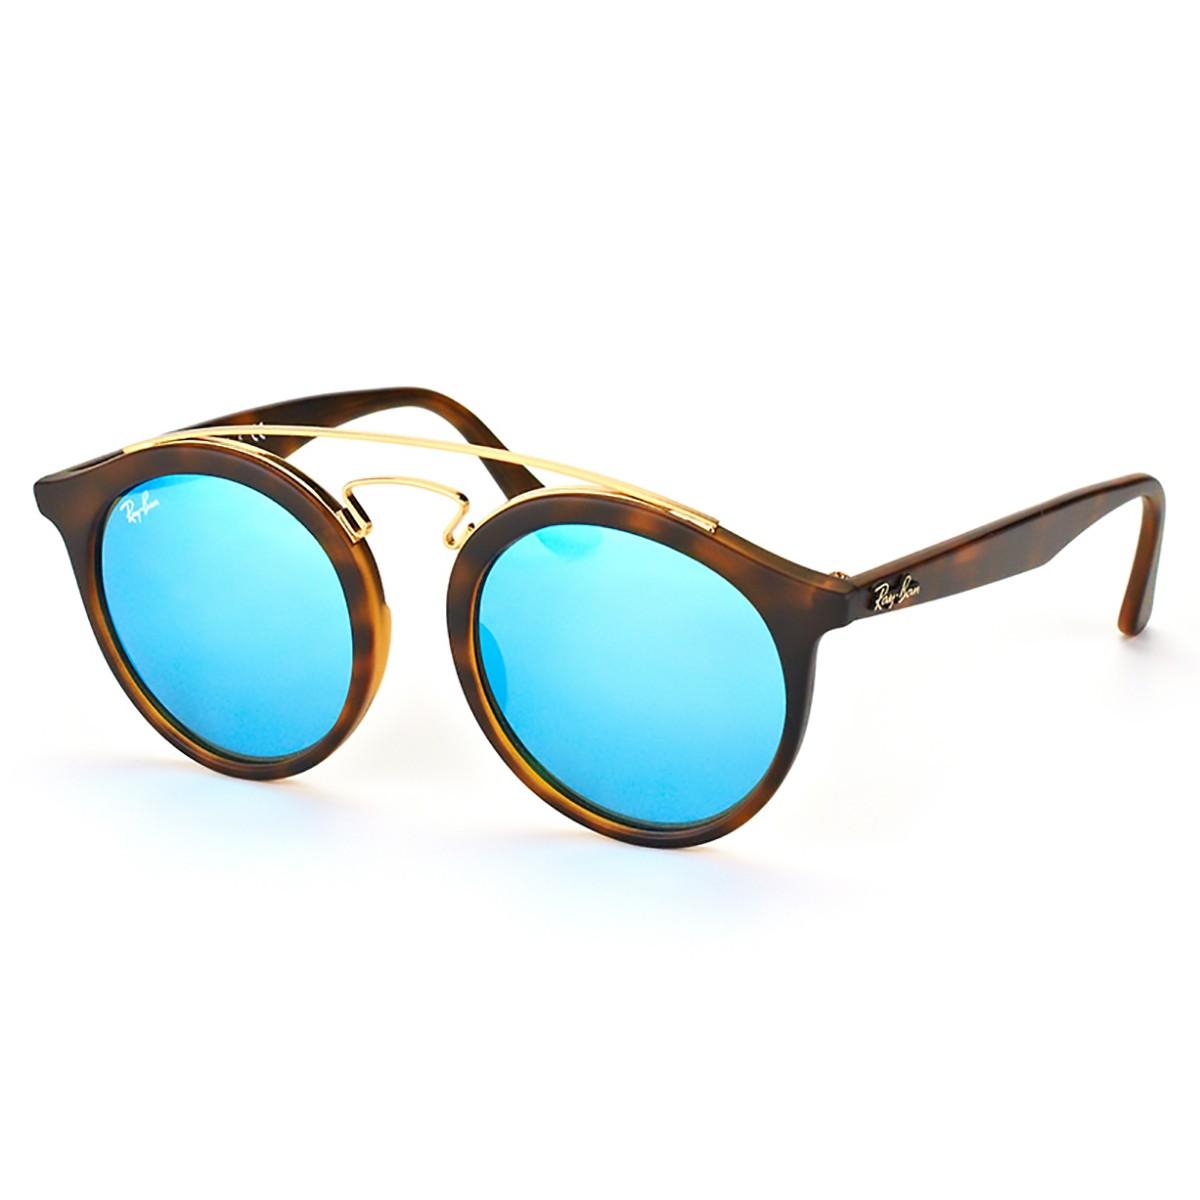 526ea3de9 Oculos De Sol Ray Ban Original Feminino – Southern California ...